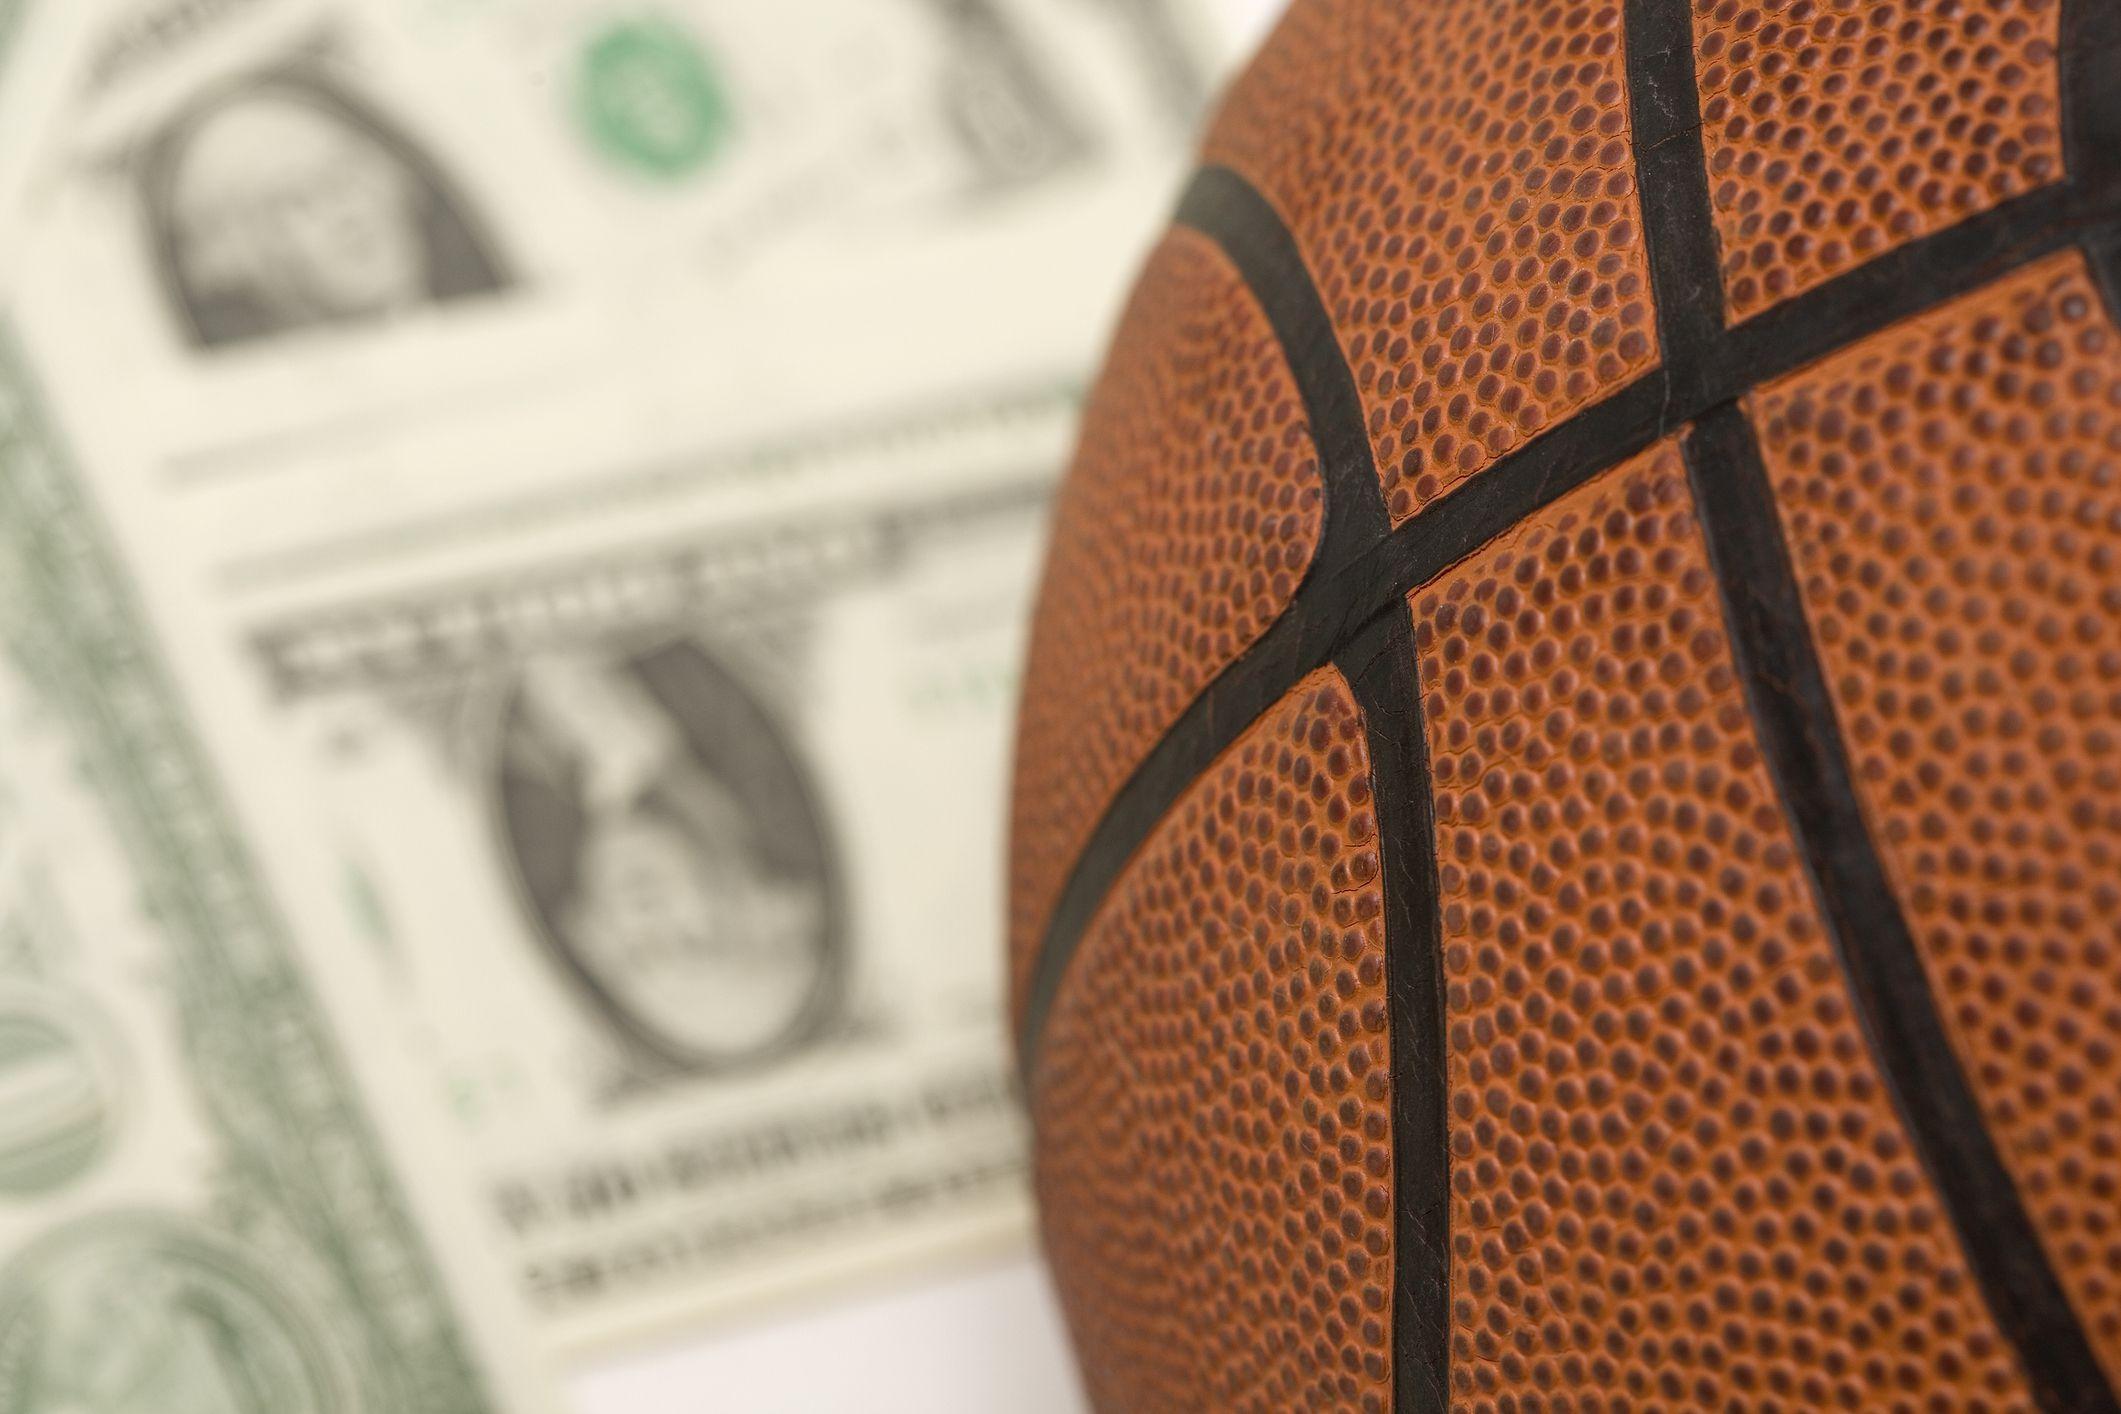 NBA MGM betting partnership